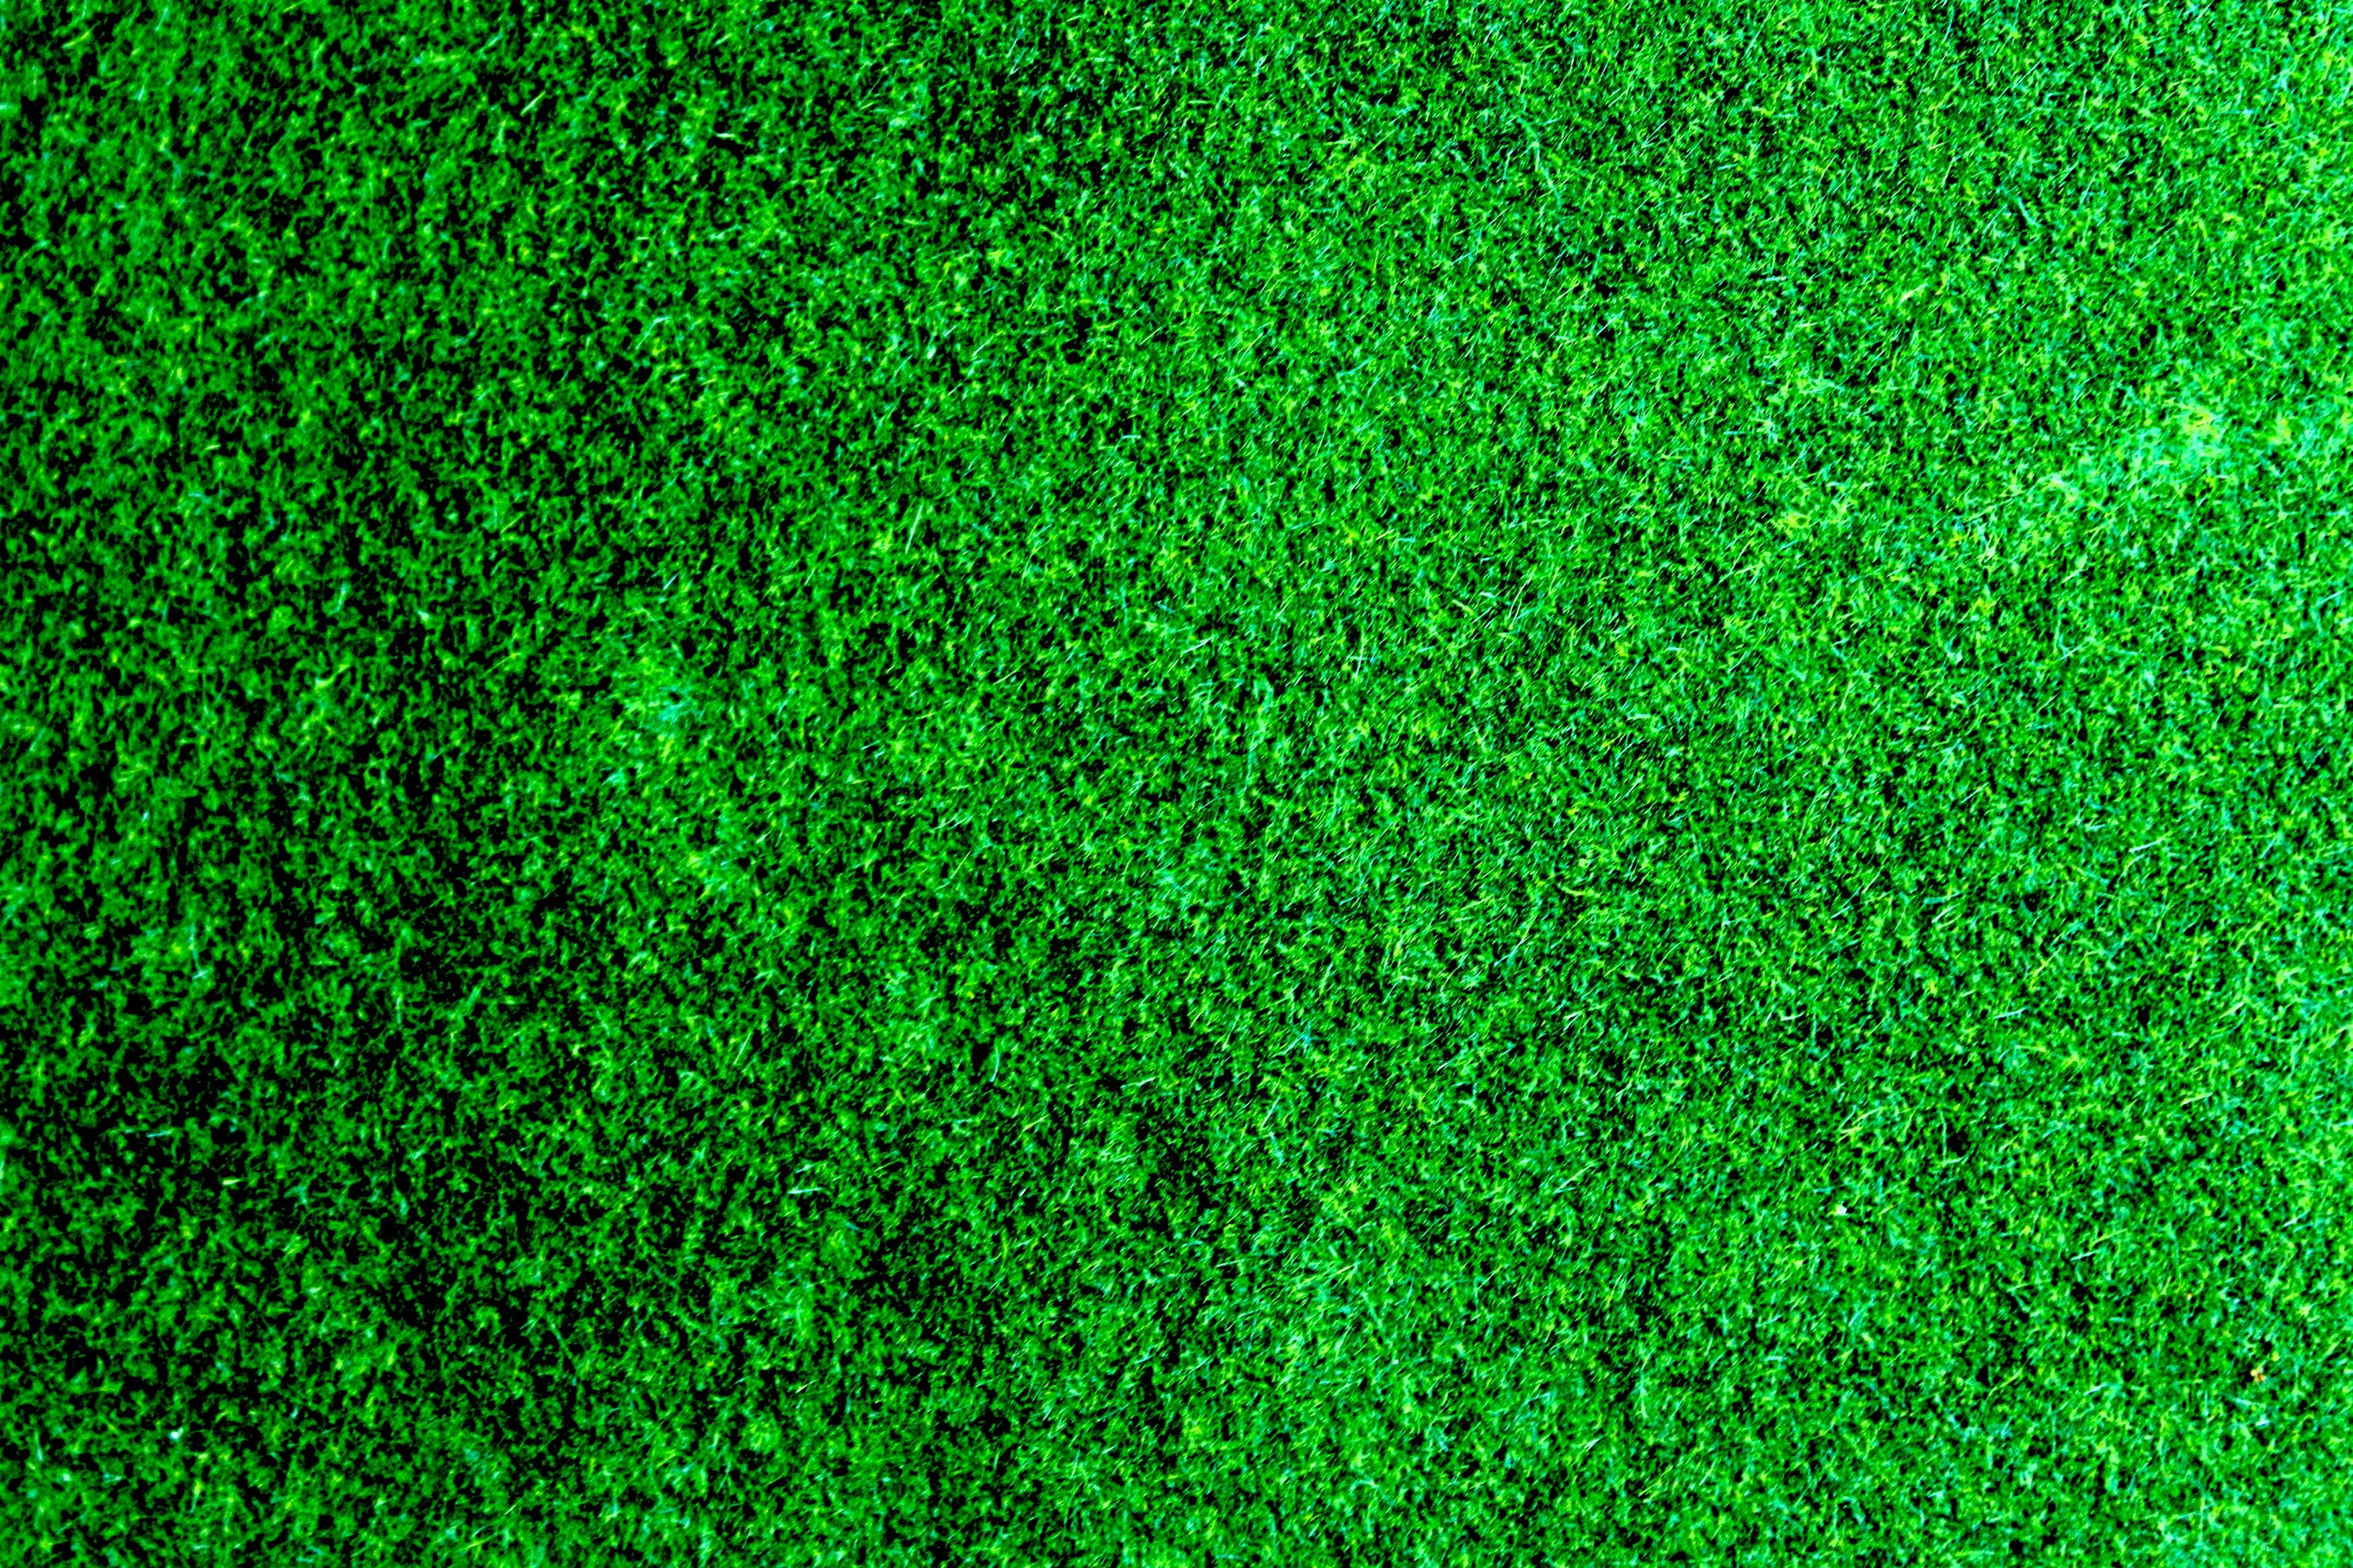 Green Lawn · Free Stock Photo